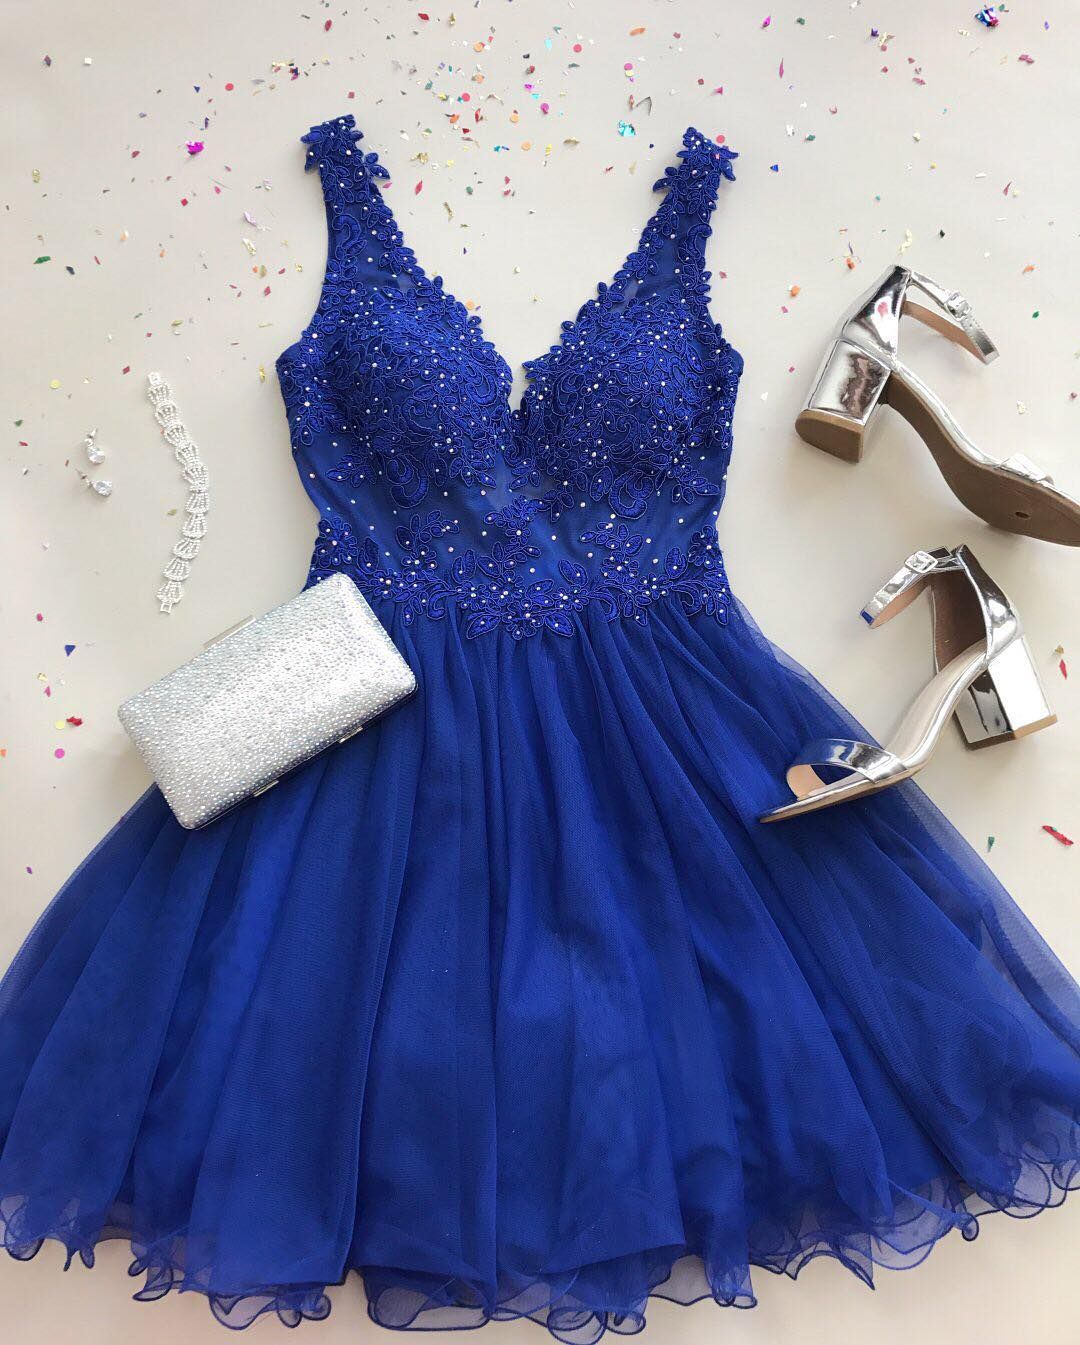 21b77c8d19c Royal blue and floral embroidery short homecoming dress available at David s  Bridal